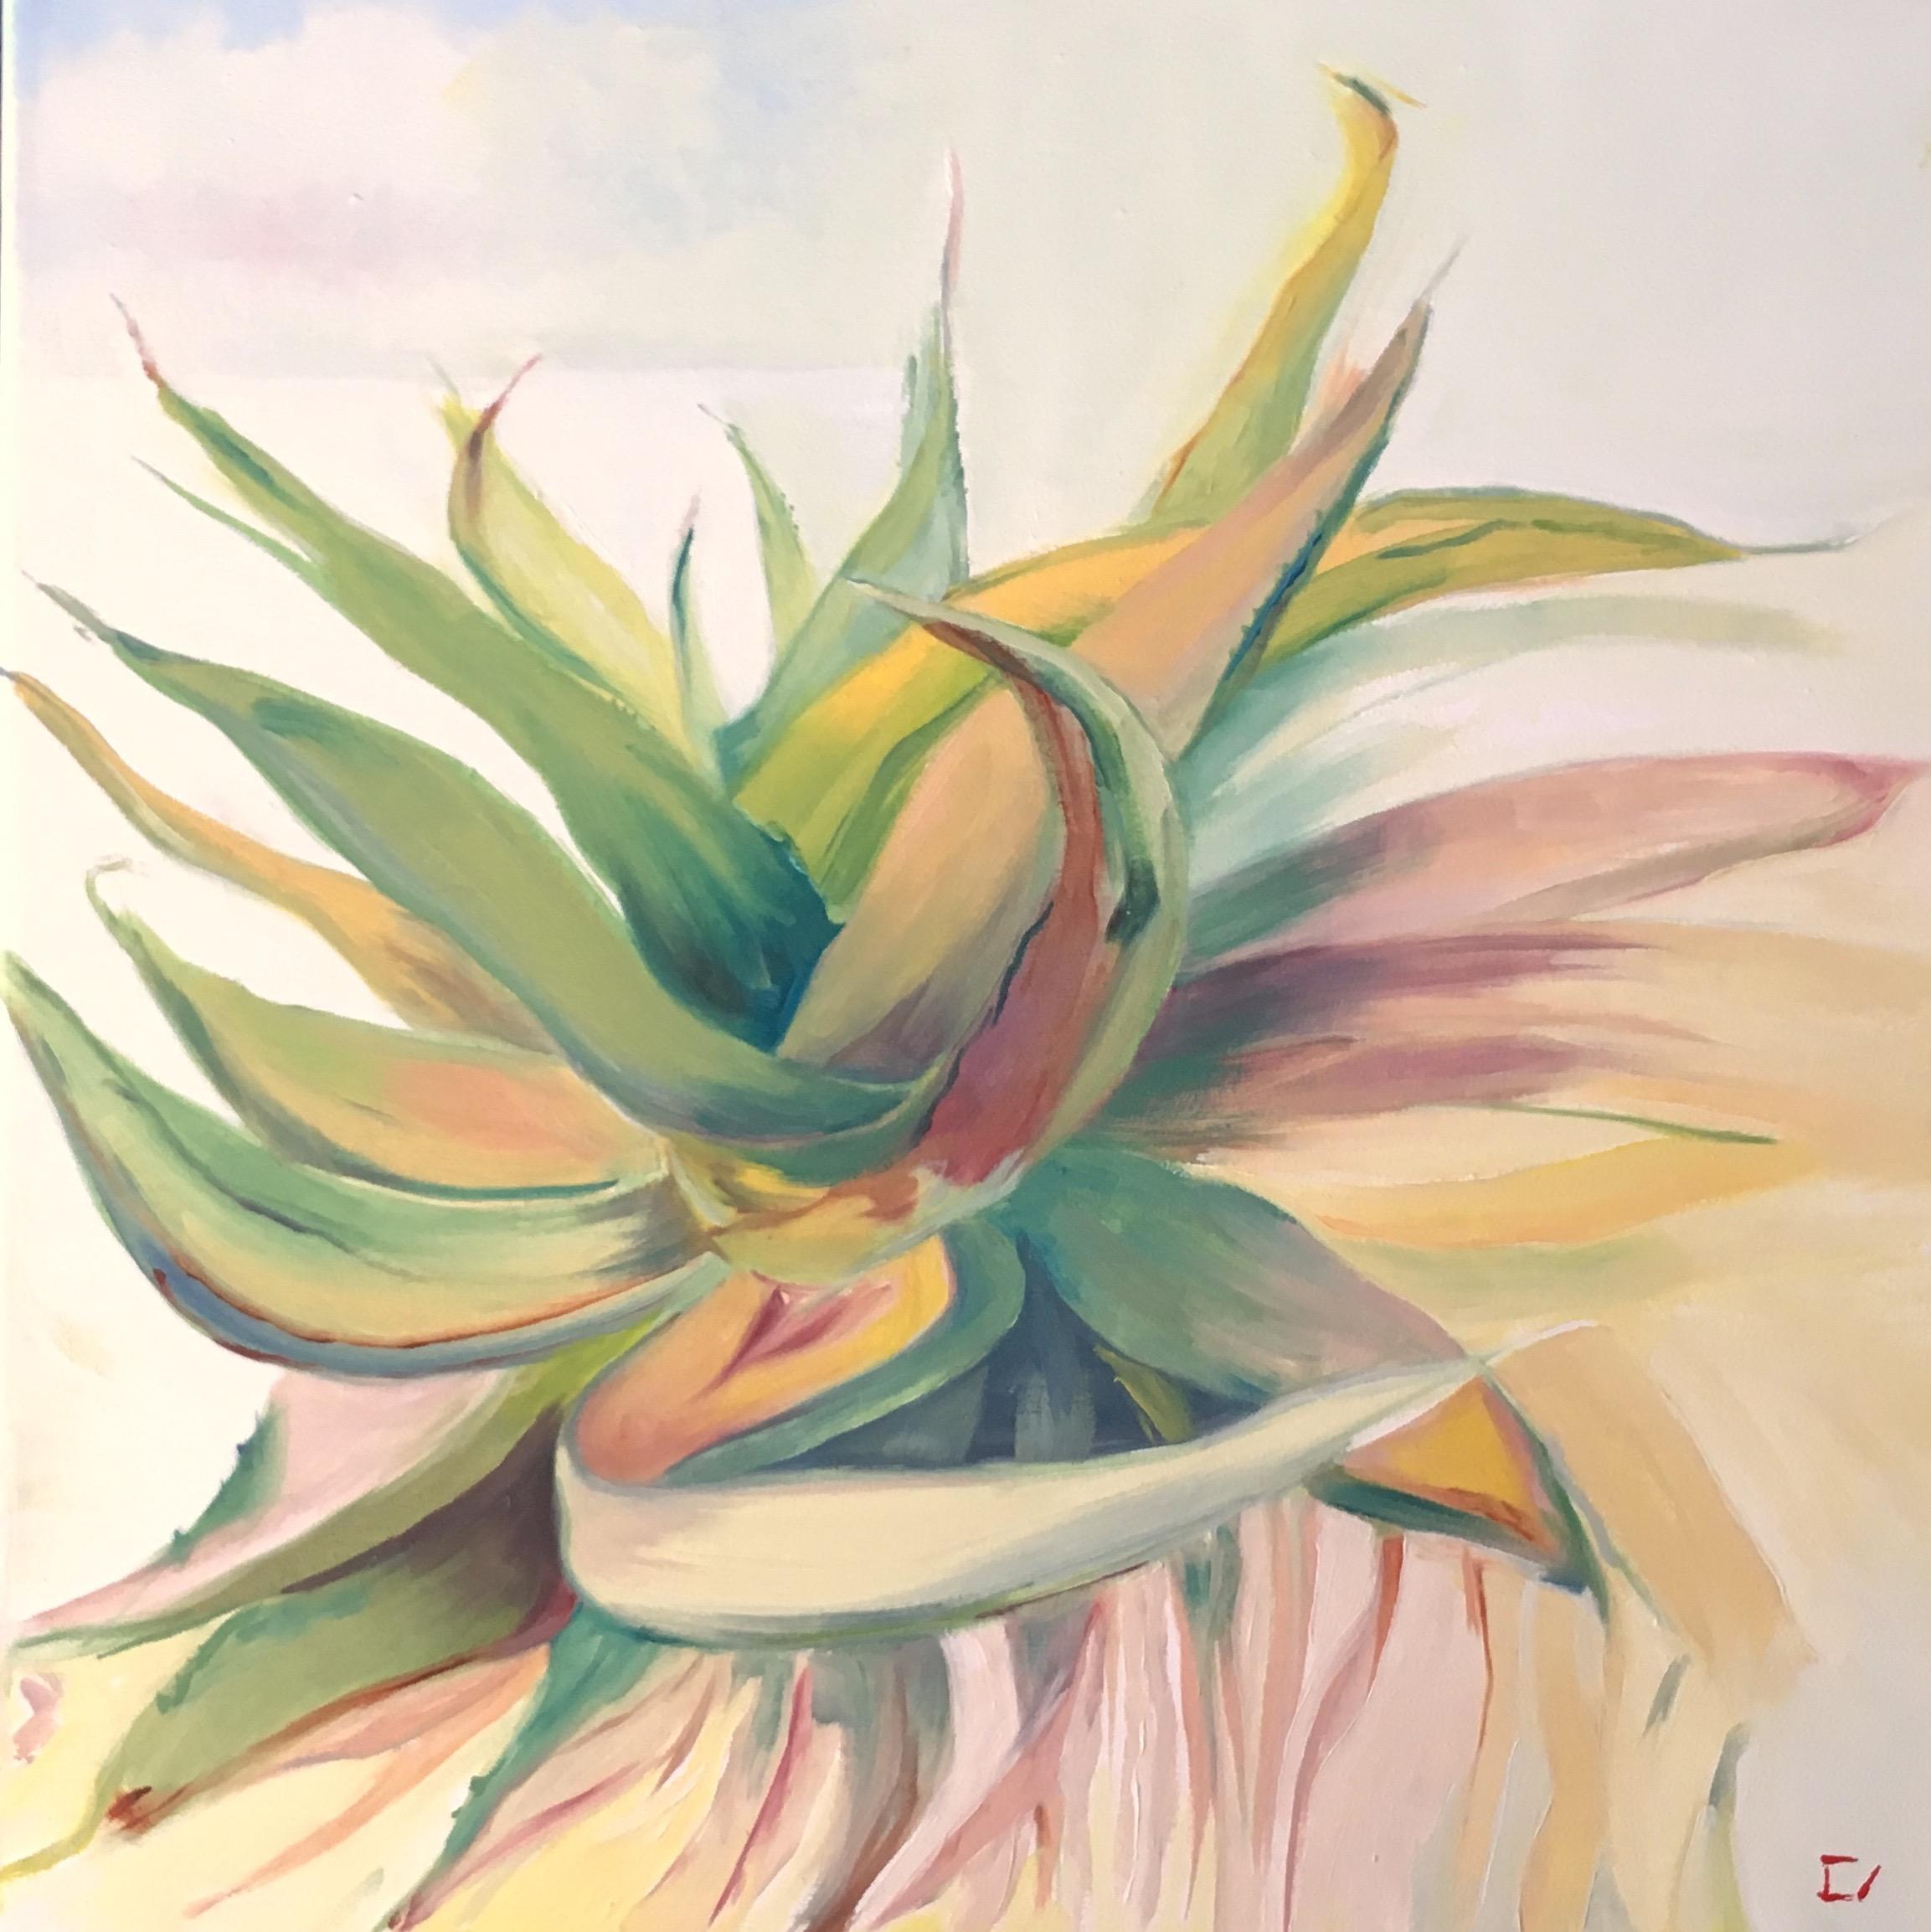 "Palmfly 2  12"" x 12""  Oil on Canvas"